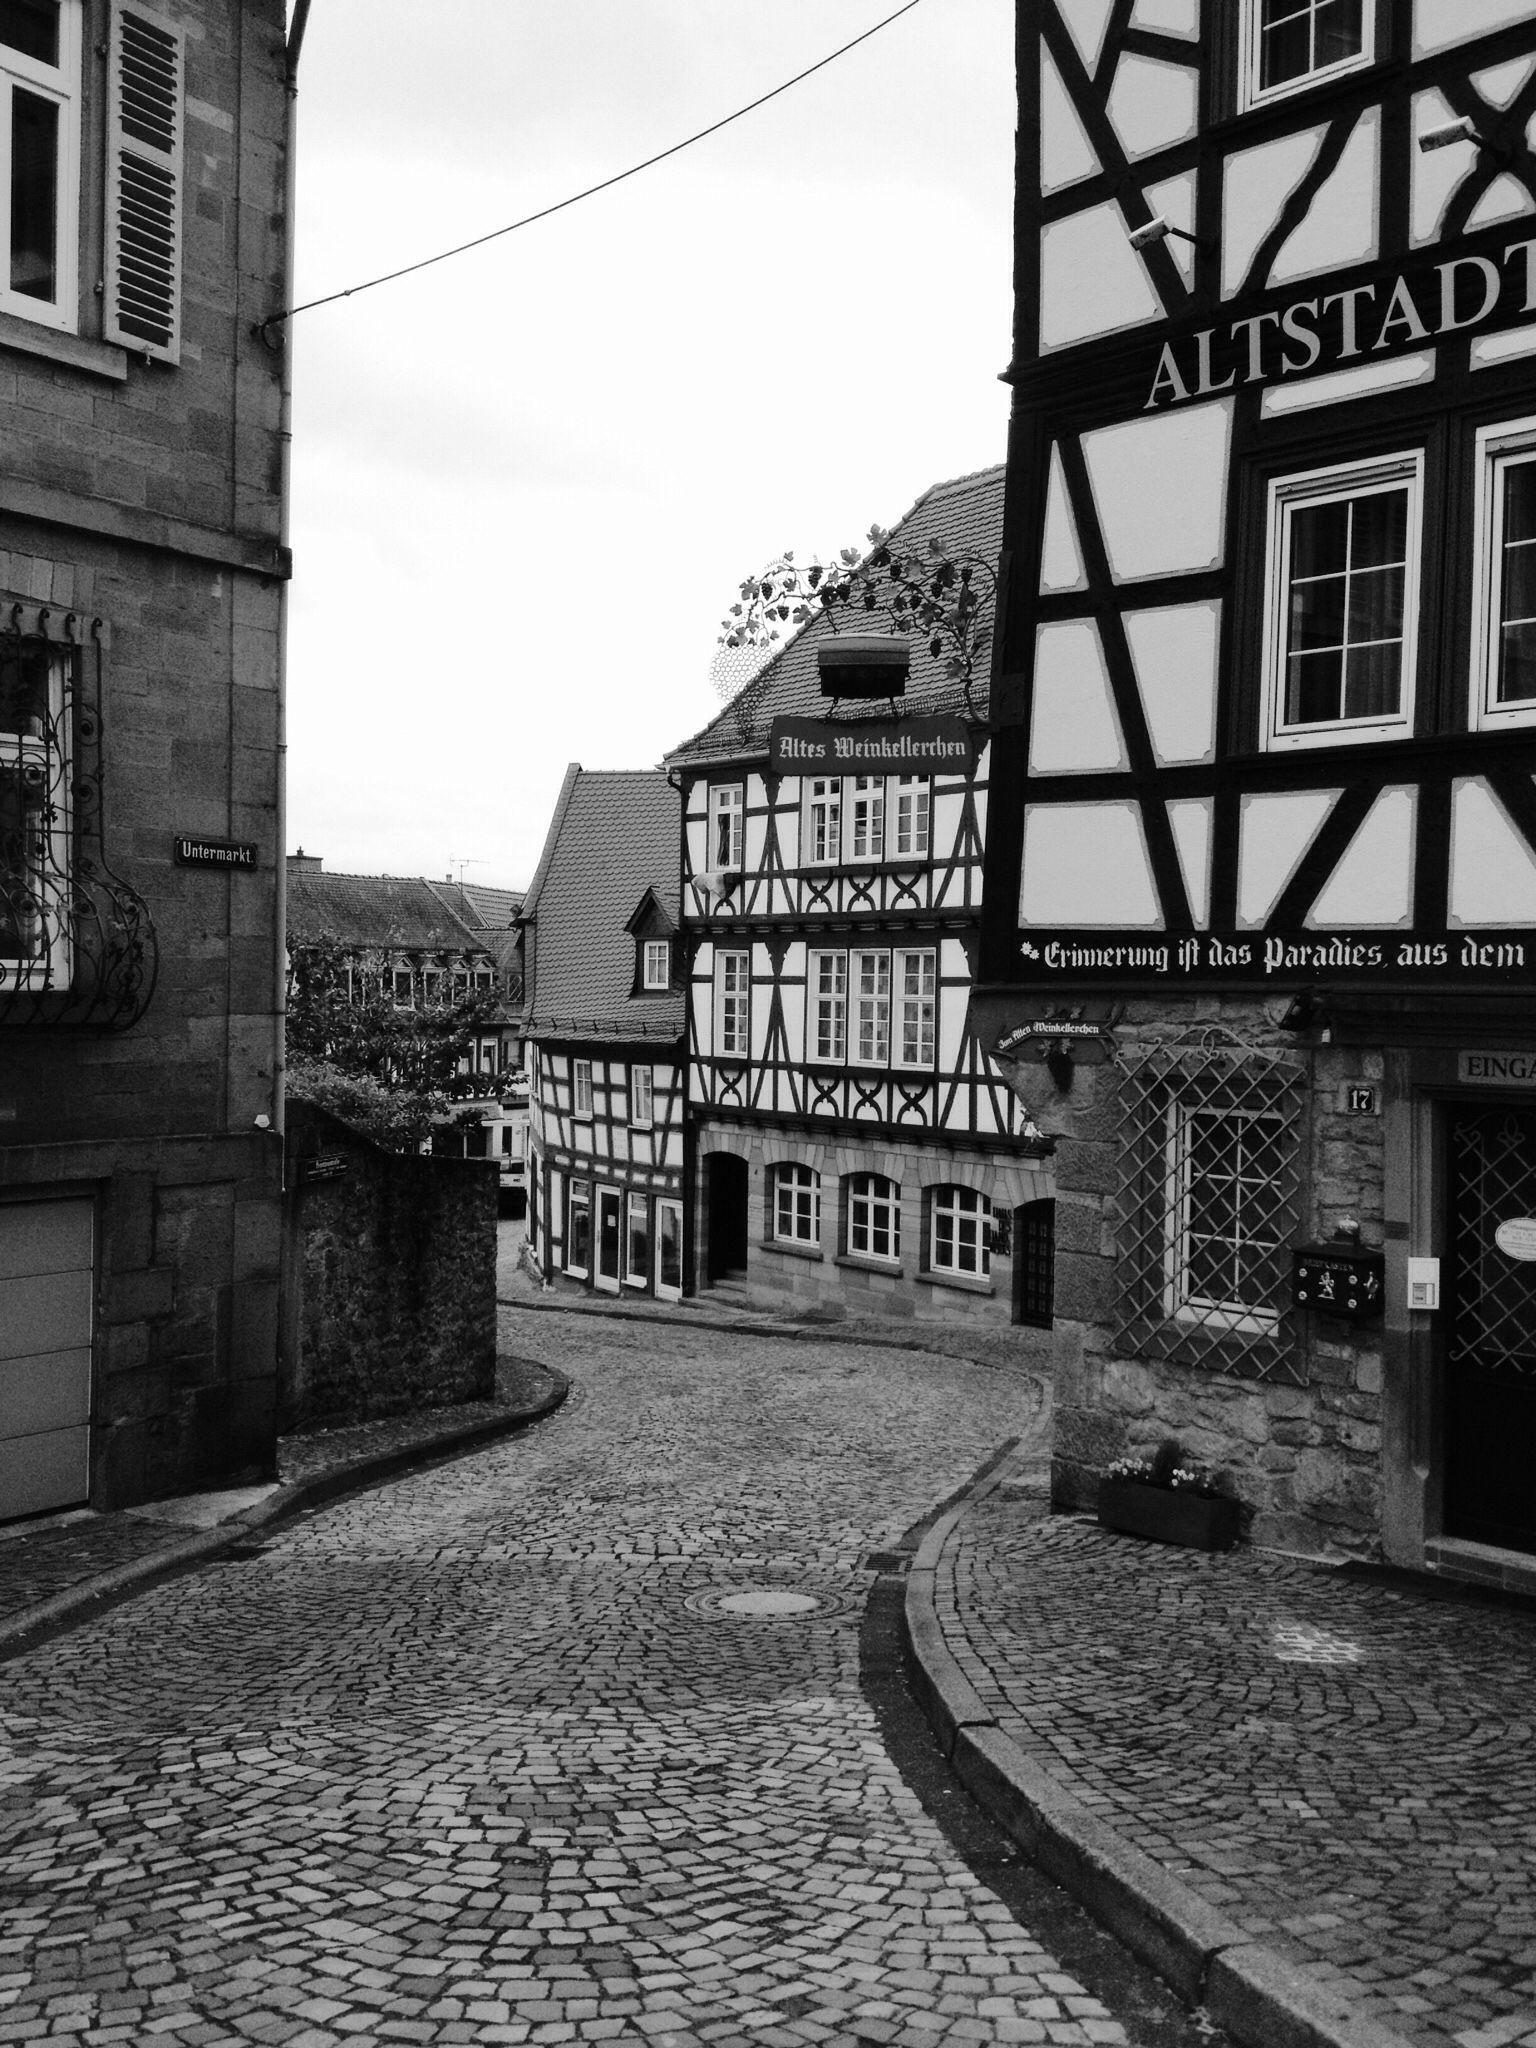 Gelnhausen Germany Cities In Germany Germany Germany Travel